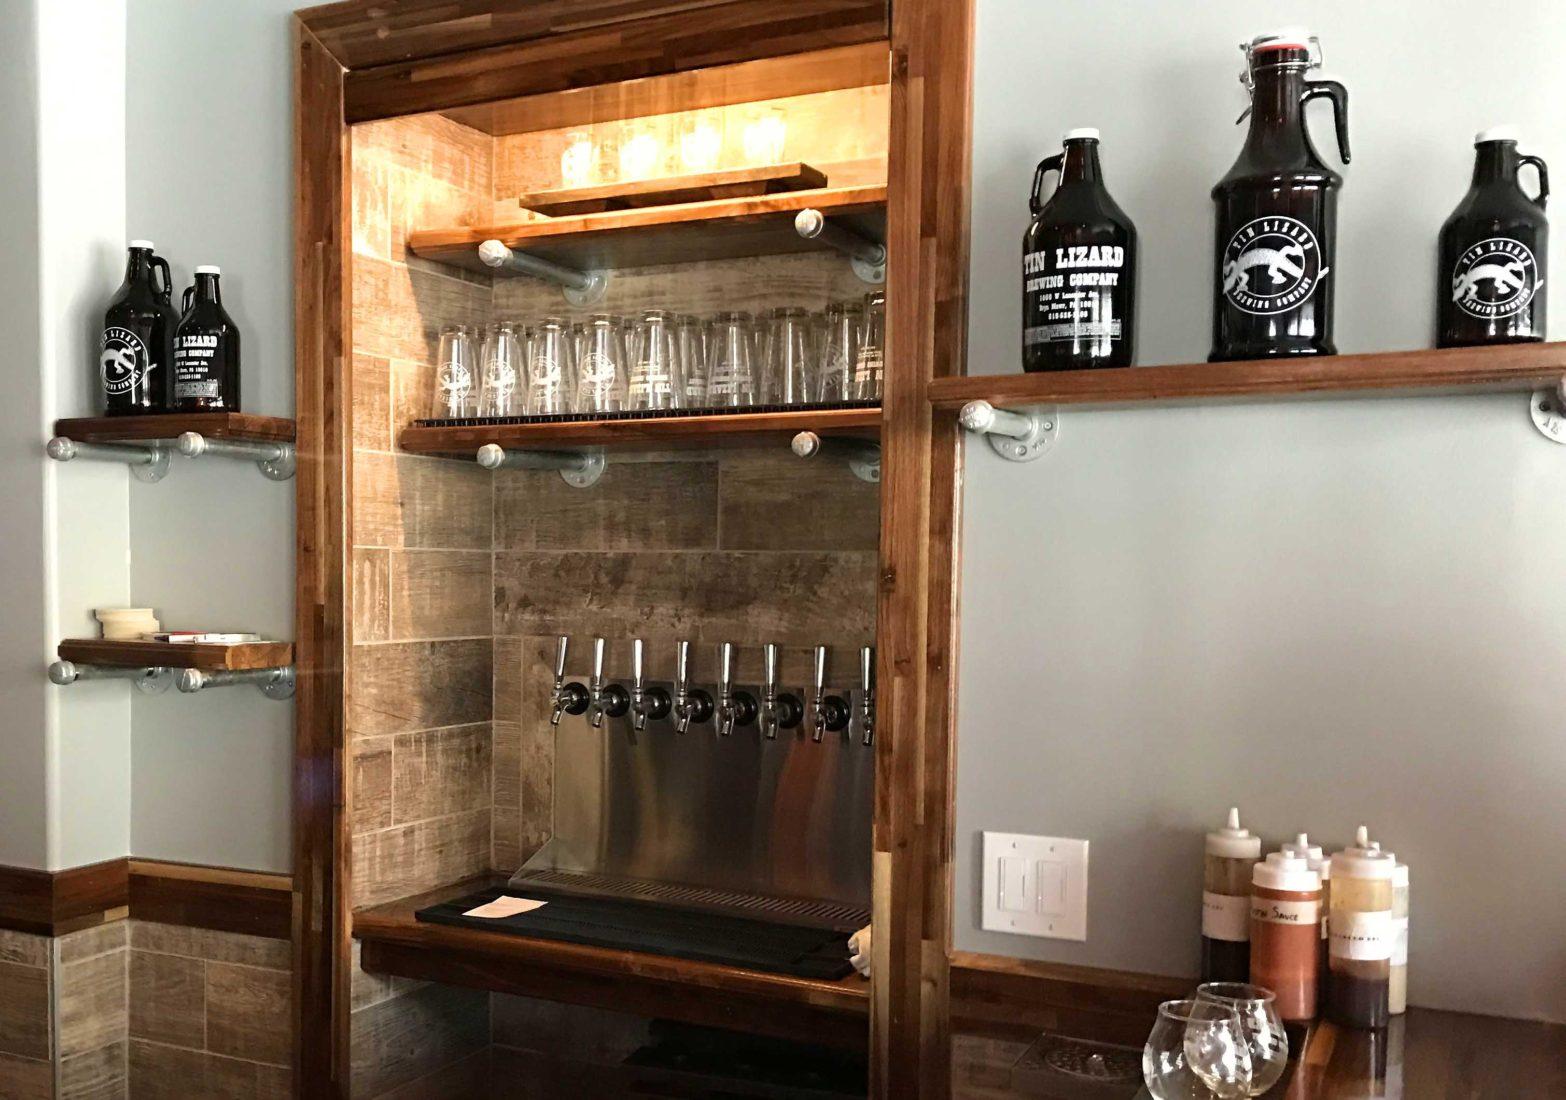 328. Tin Lizard Brewing Co, Bryn Mawr PA, 2017